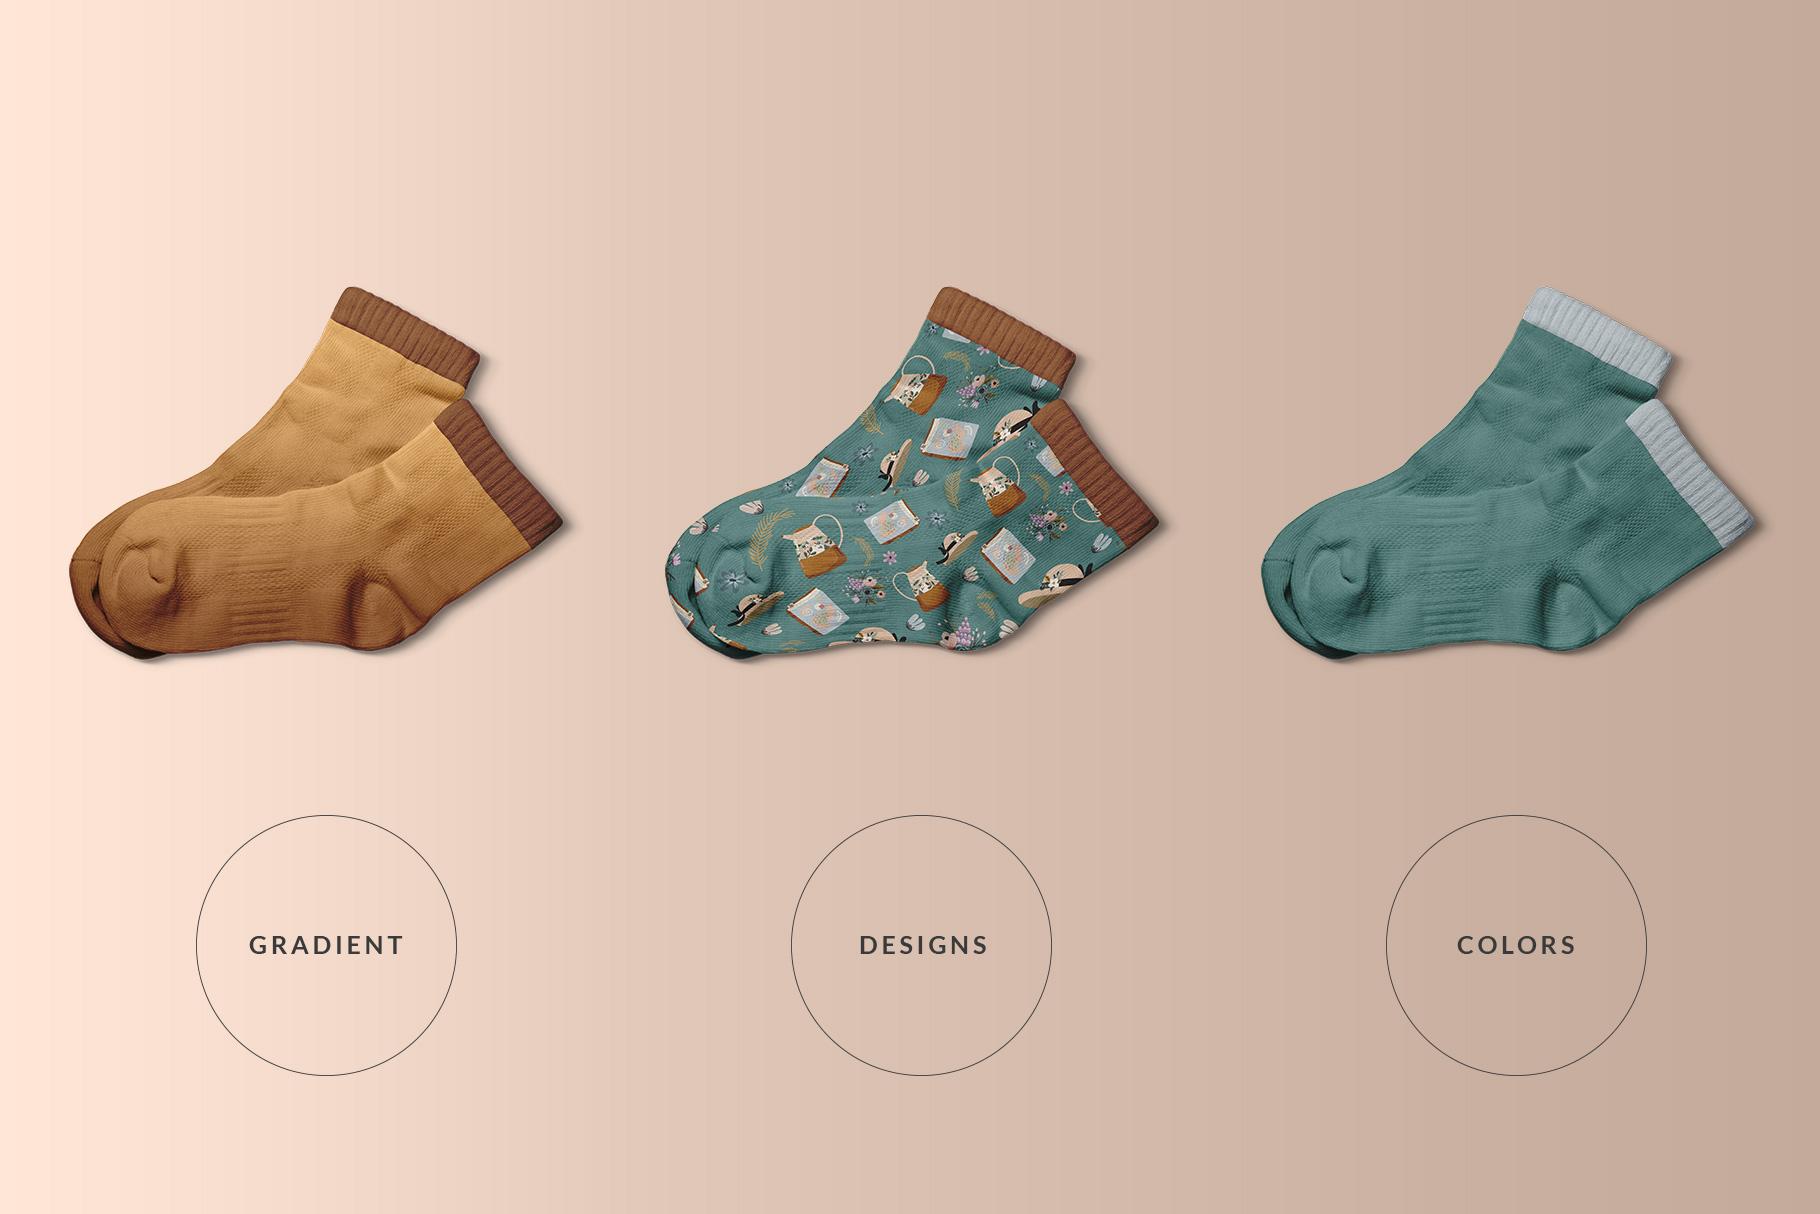 types of the top view half socks mockup